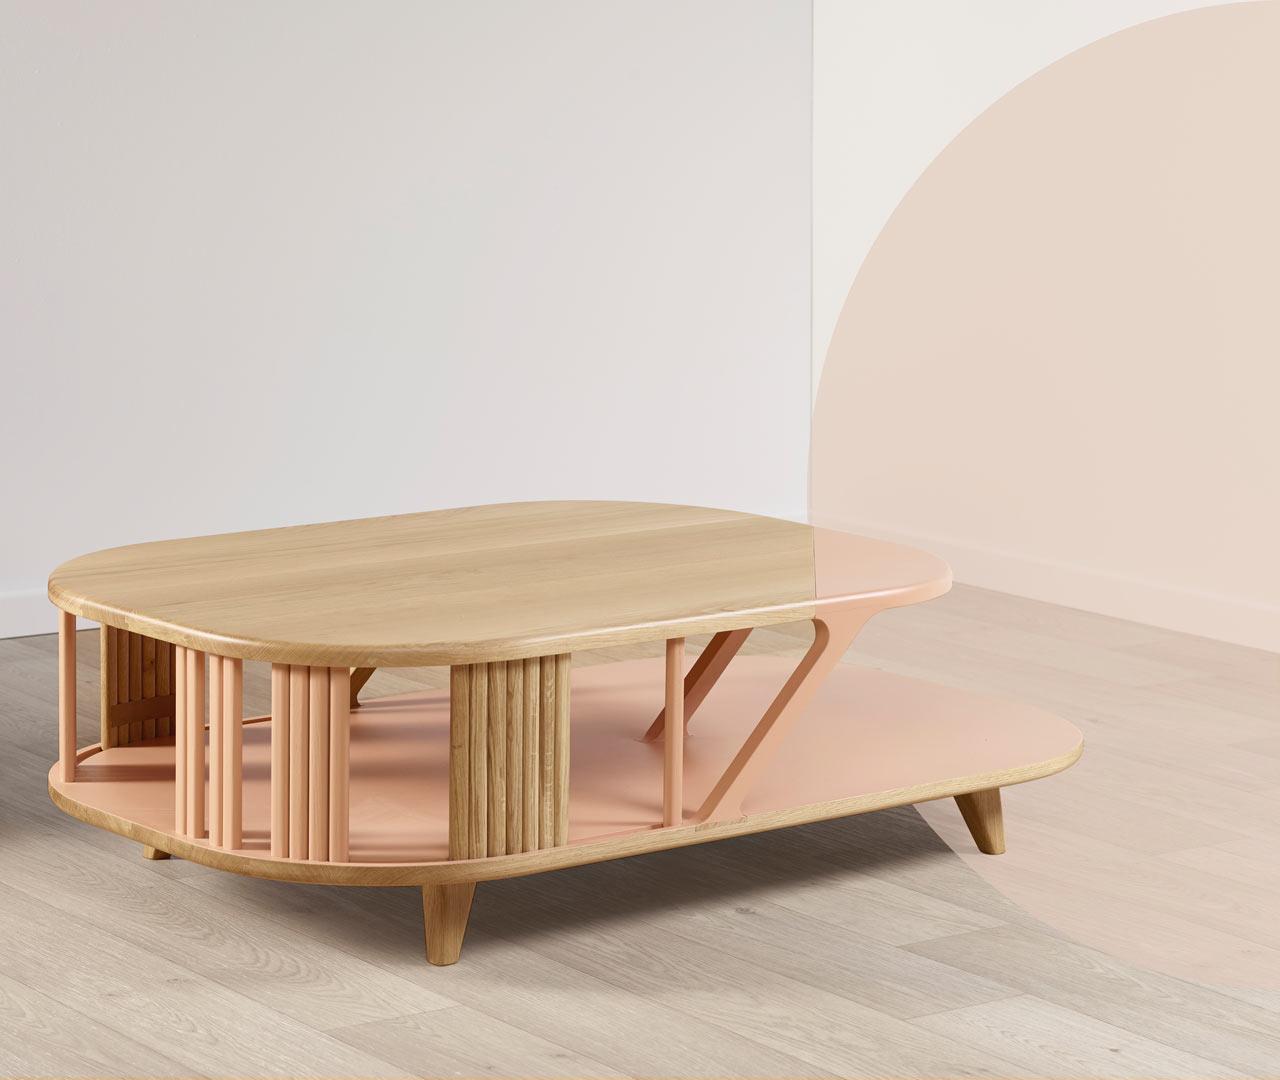 Julie-Gaillard-Latitude-Furniture-hisheji (3)